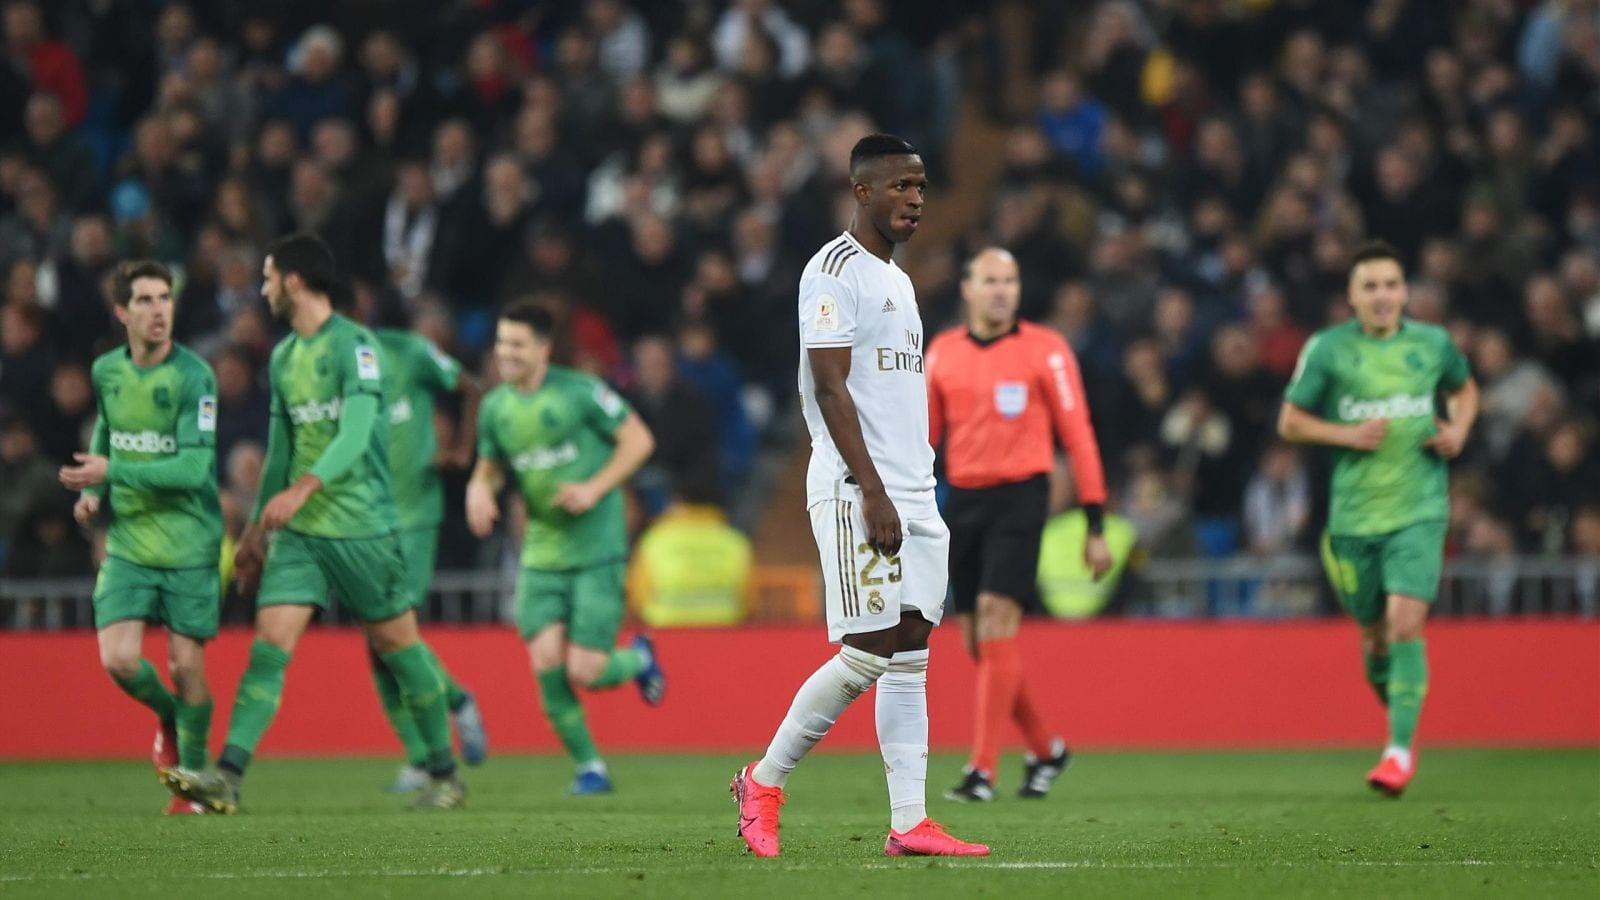 Coupe du Roi: La Real Sociedad élimine le Real Madrid au Bernabeu